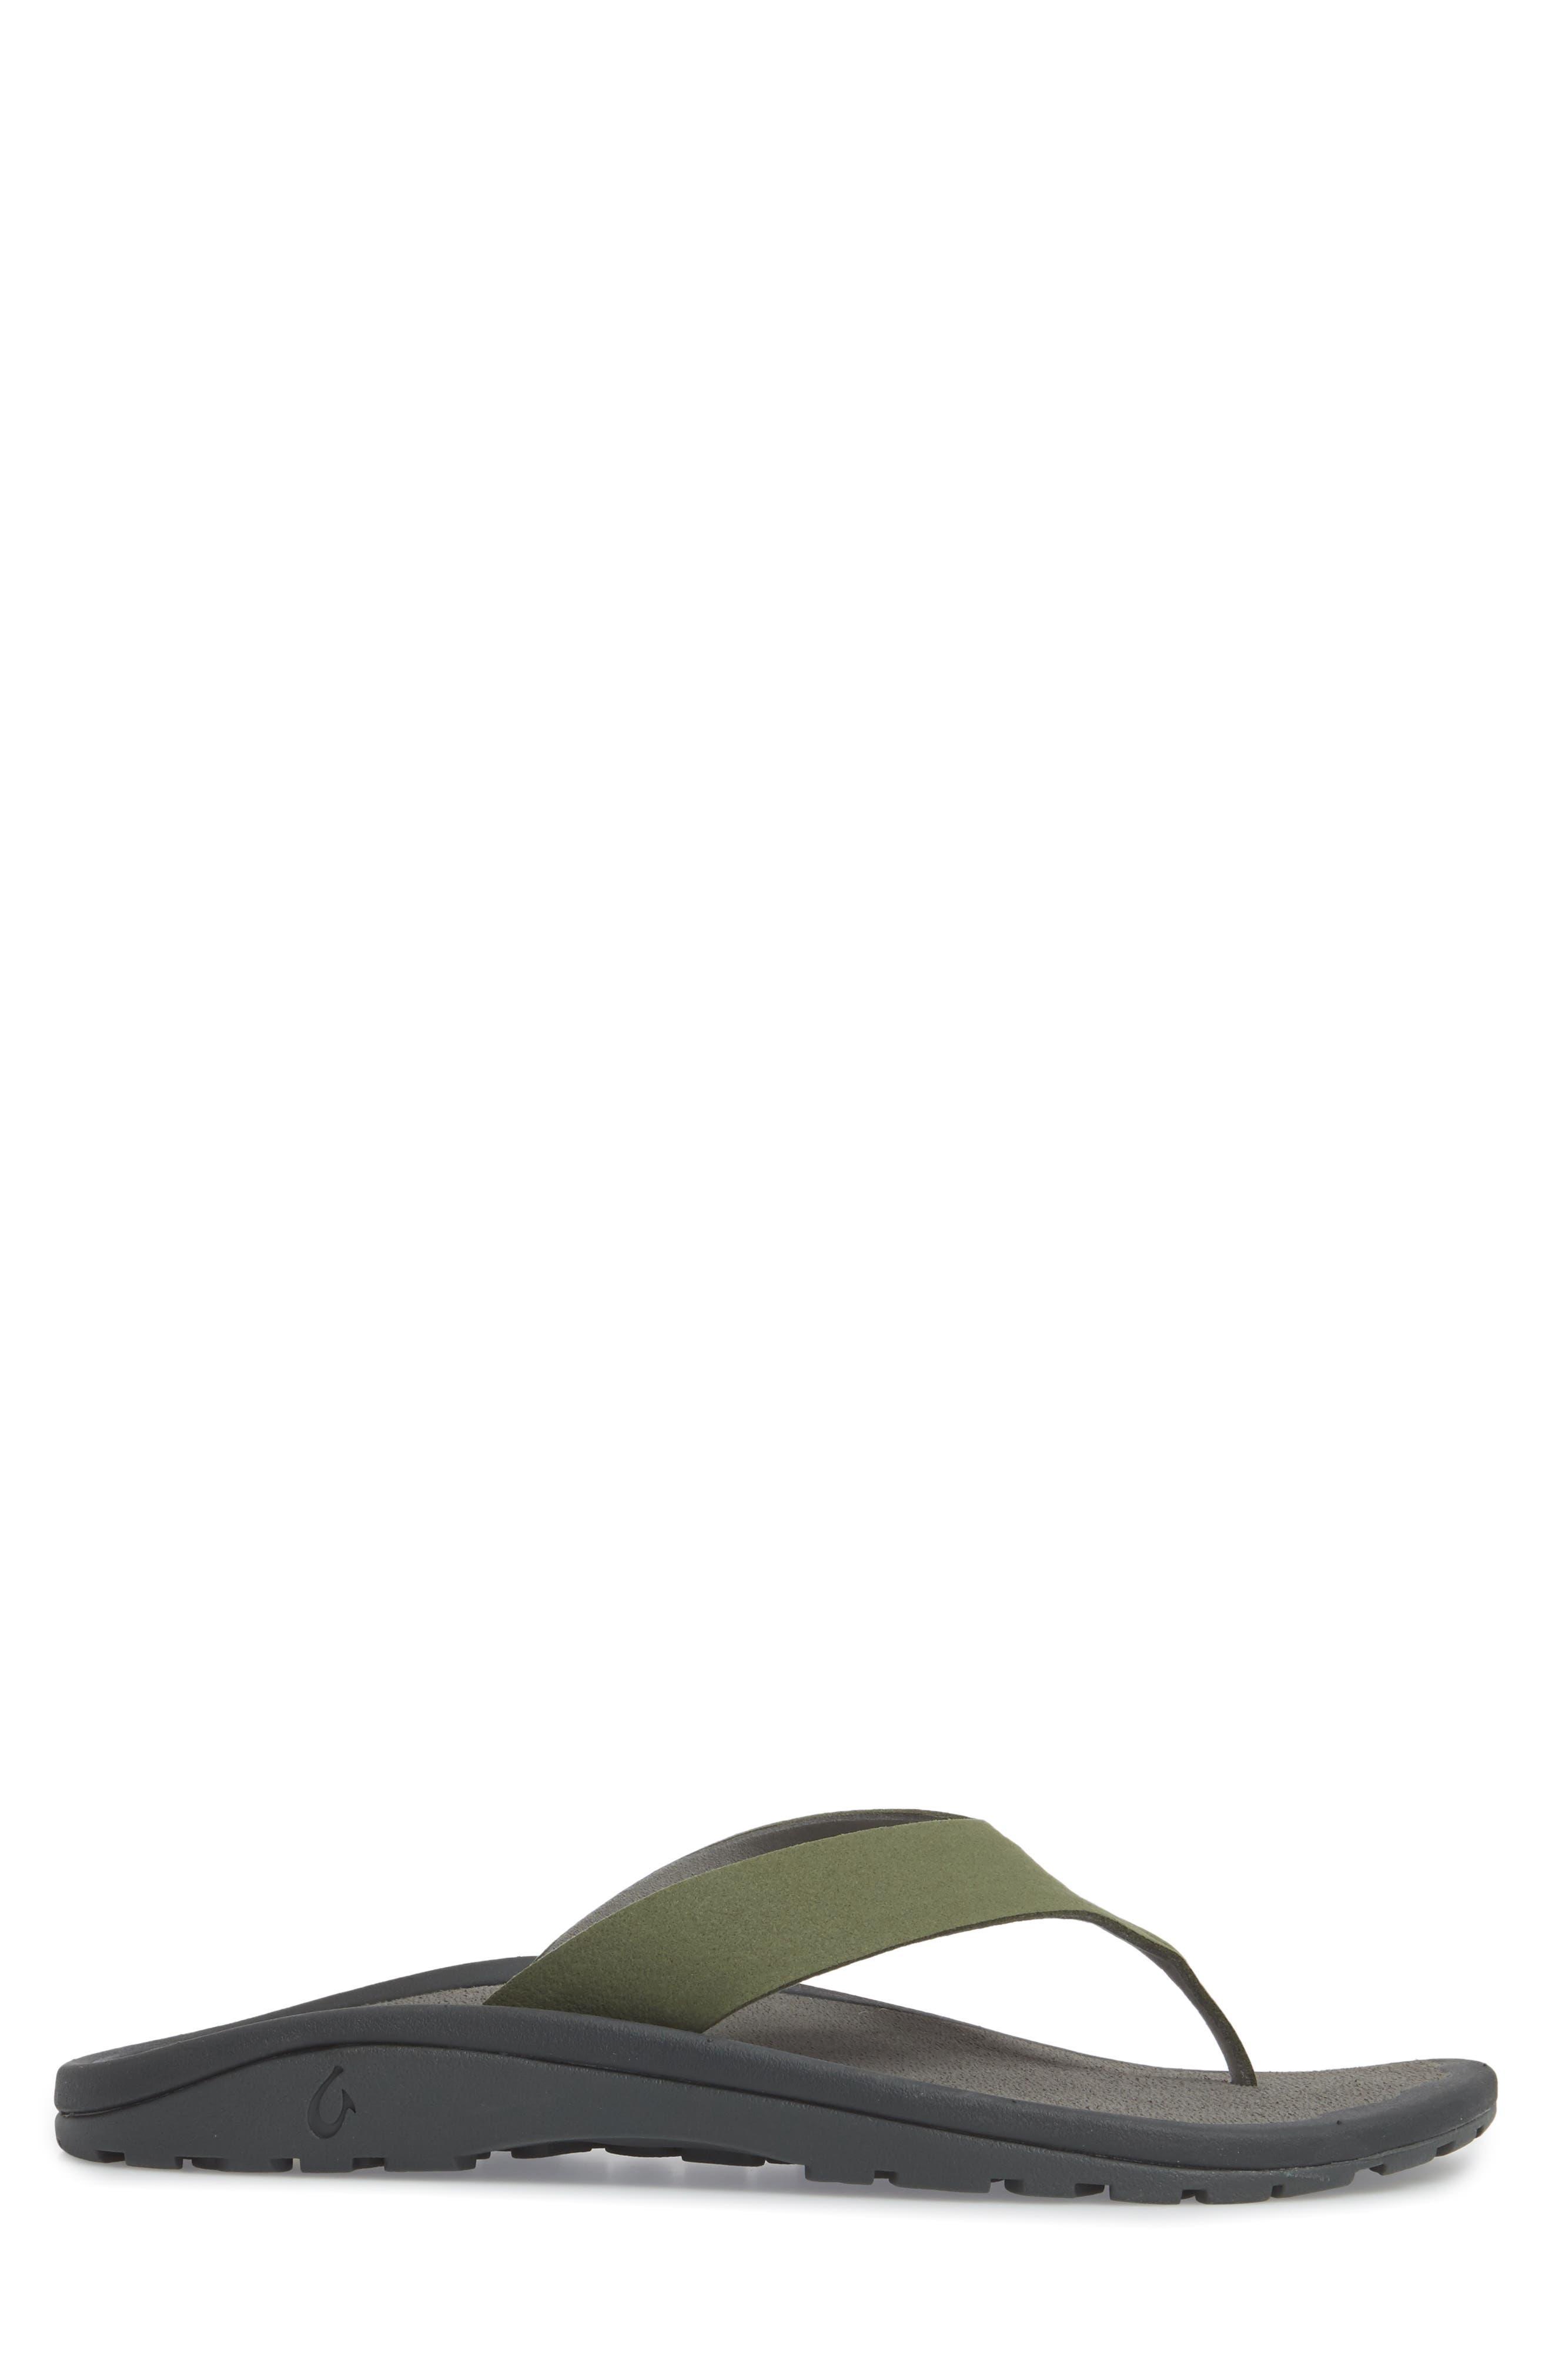 Ohana Ho'okahi Flip Flop,                             Alternate thumbnail 3, color,                             SEA GRASS/ CHARCOAL